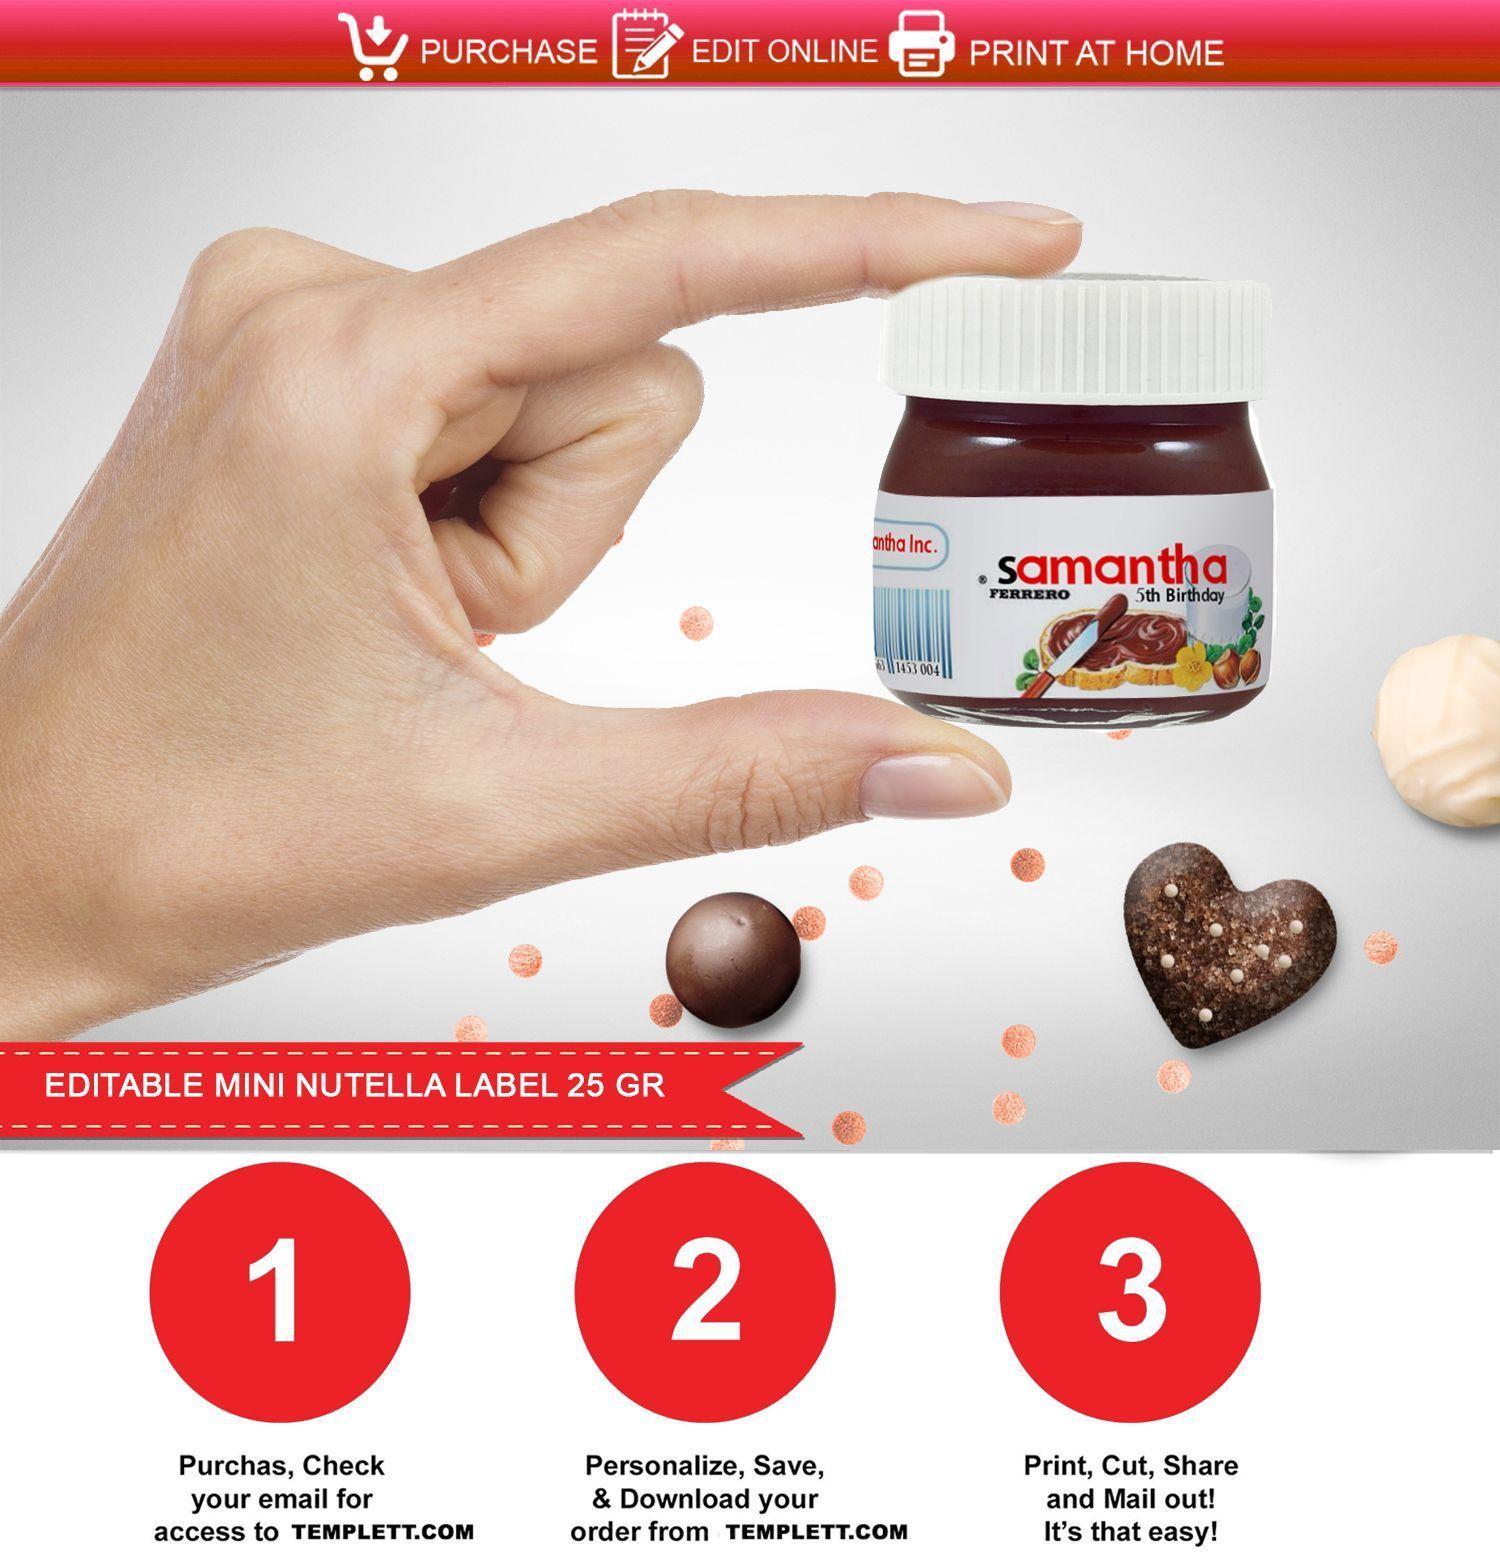 Nutella Etiqueta Imprimible Mini Frasco De 25 Gr Nutella Label Mini Nutella Nutella